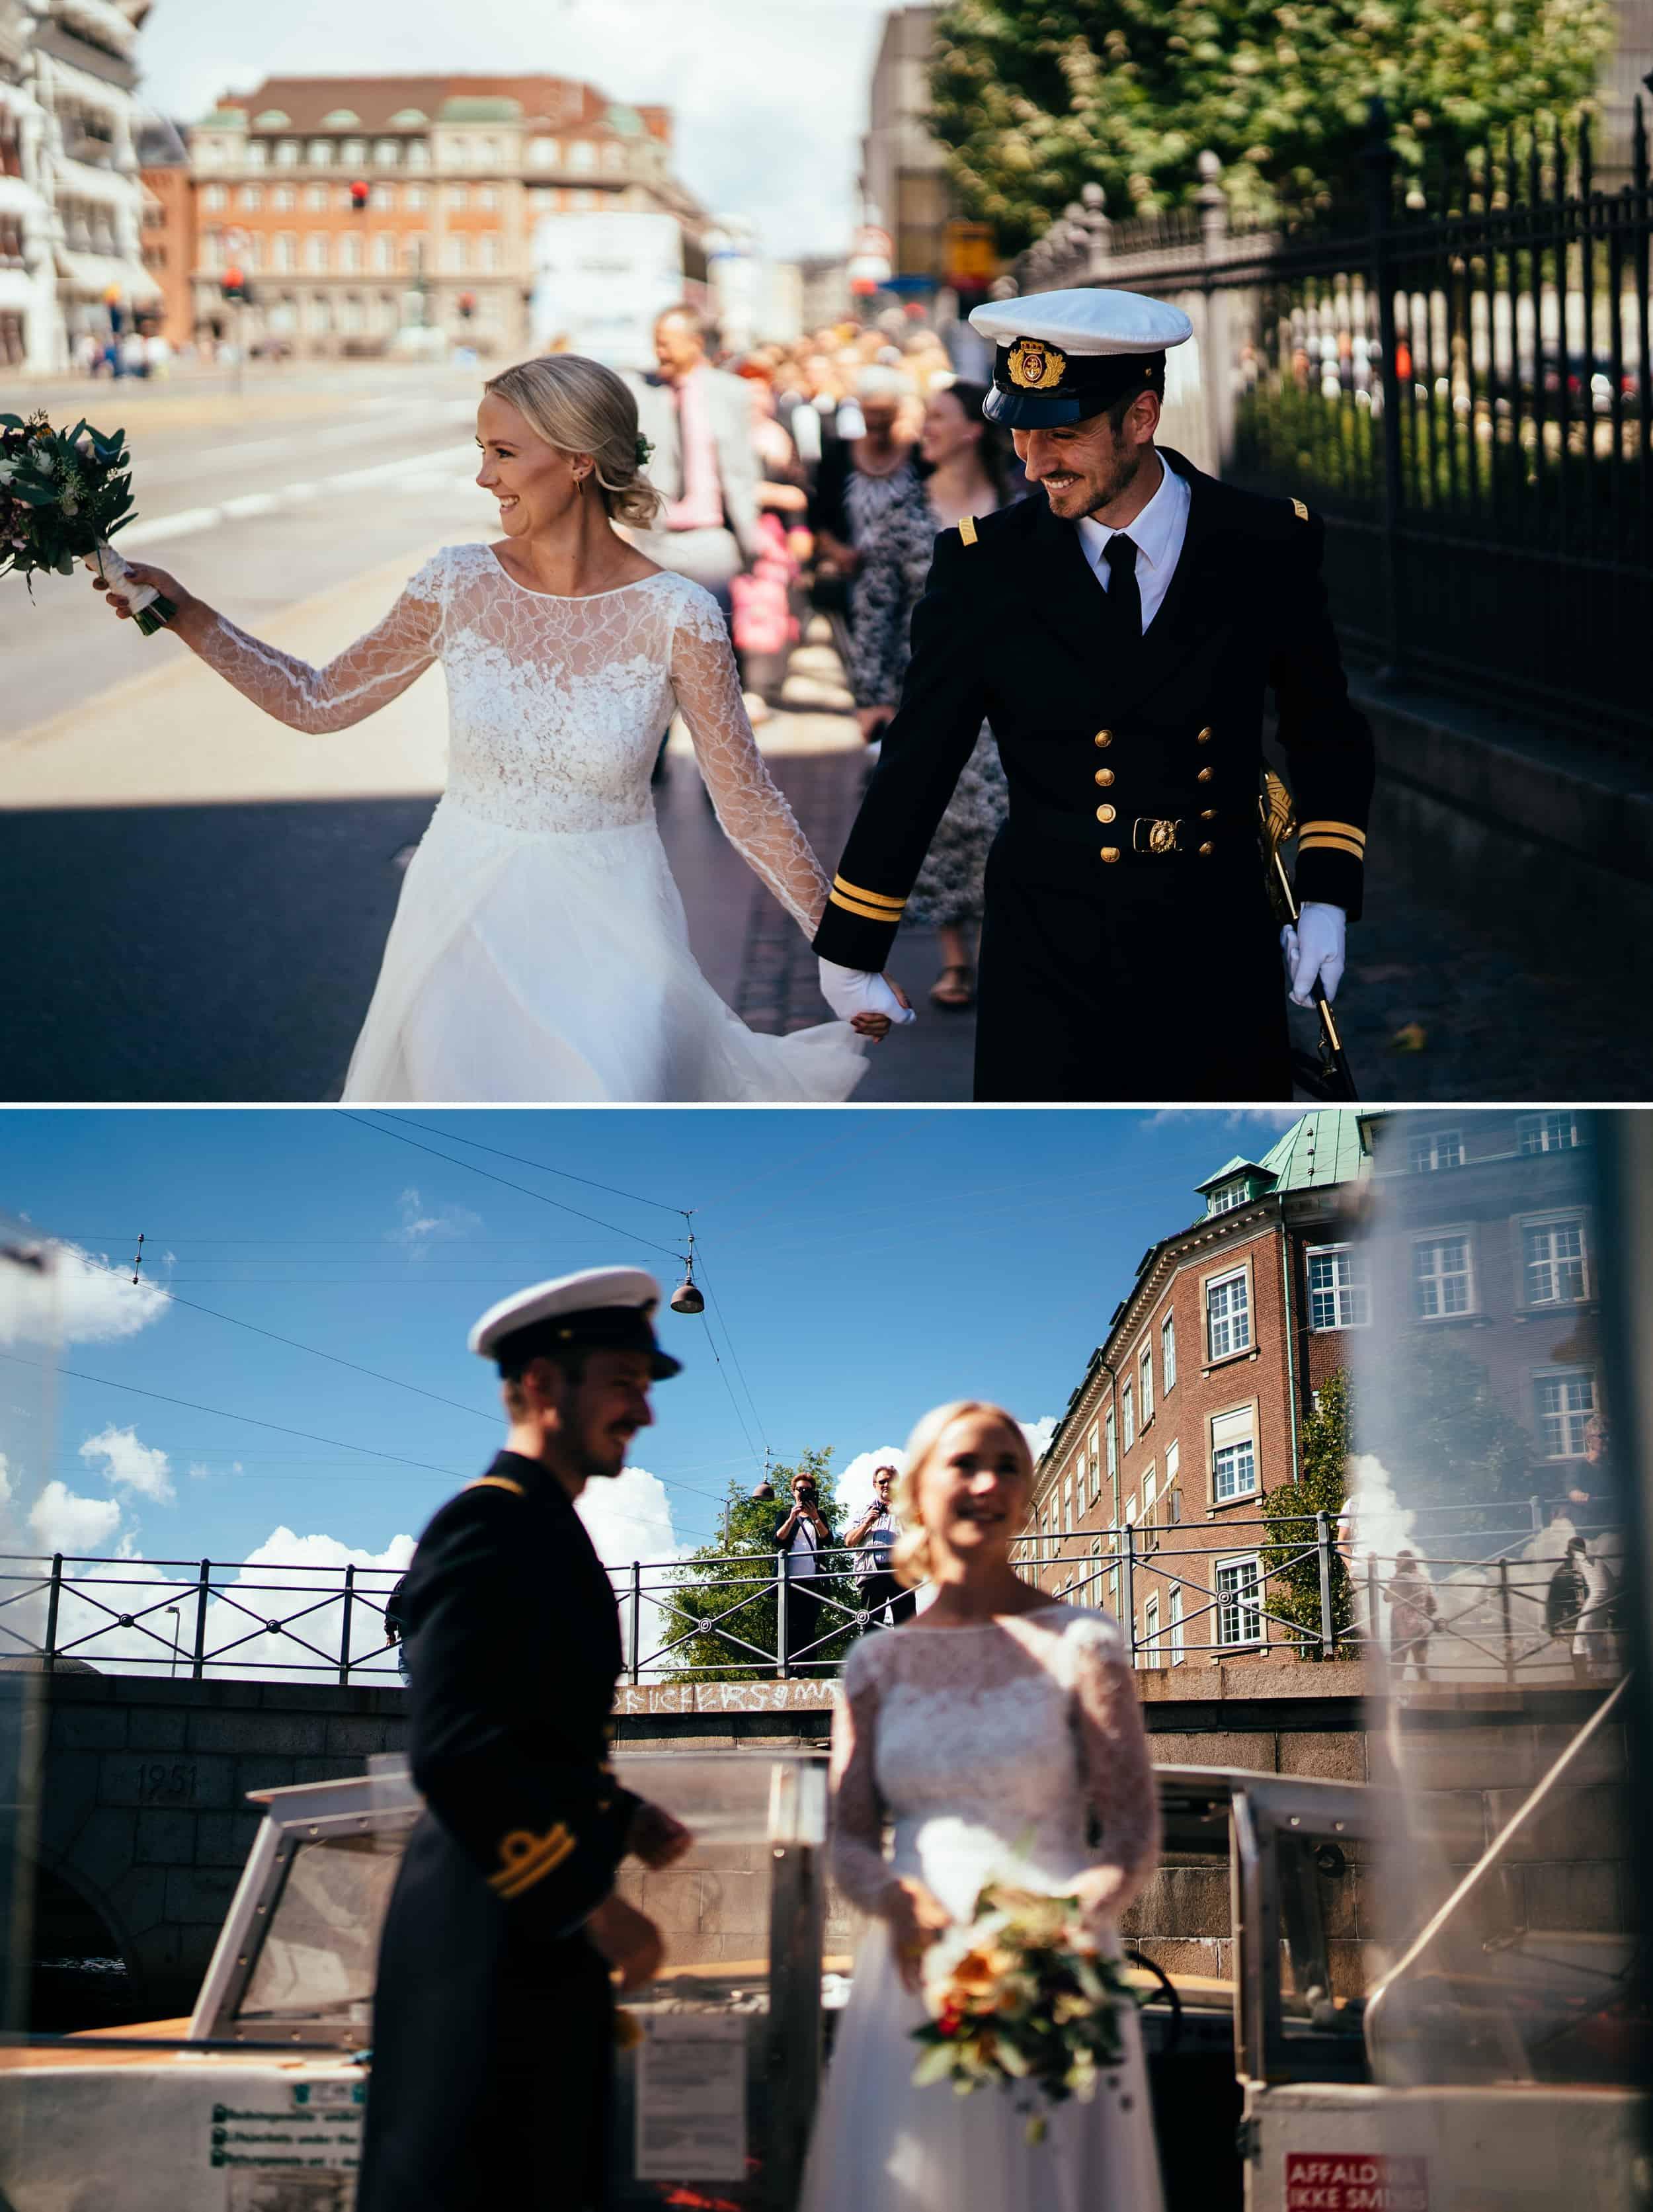 kanalrundfart-bryllup-københavn.jpg